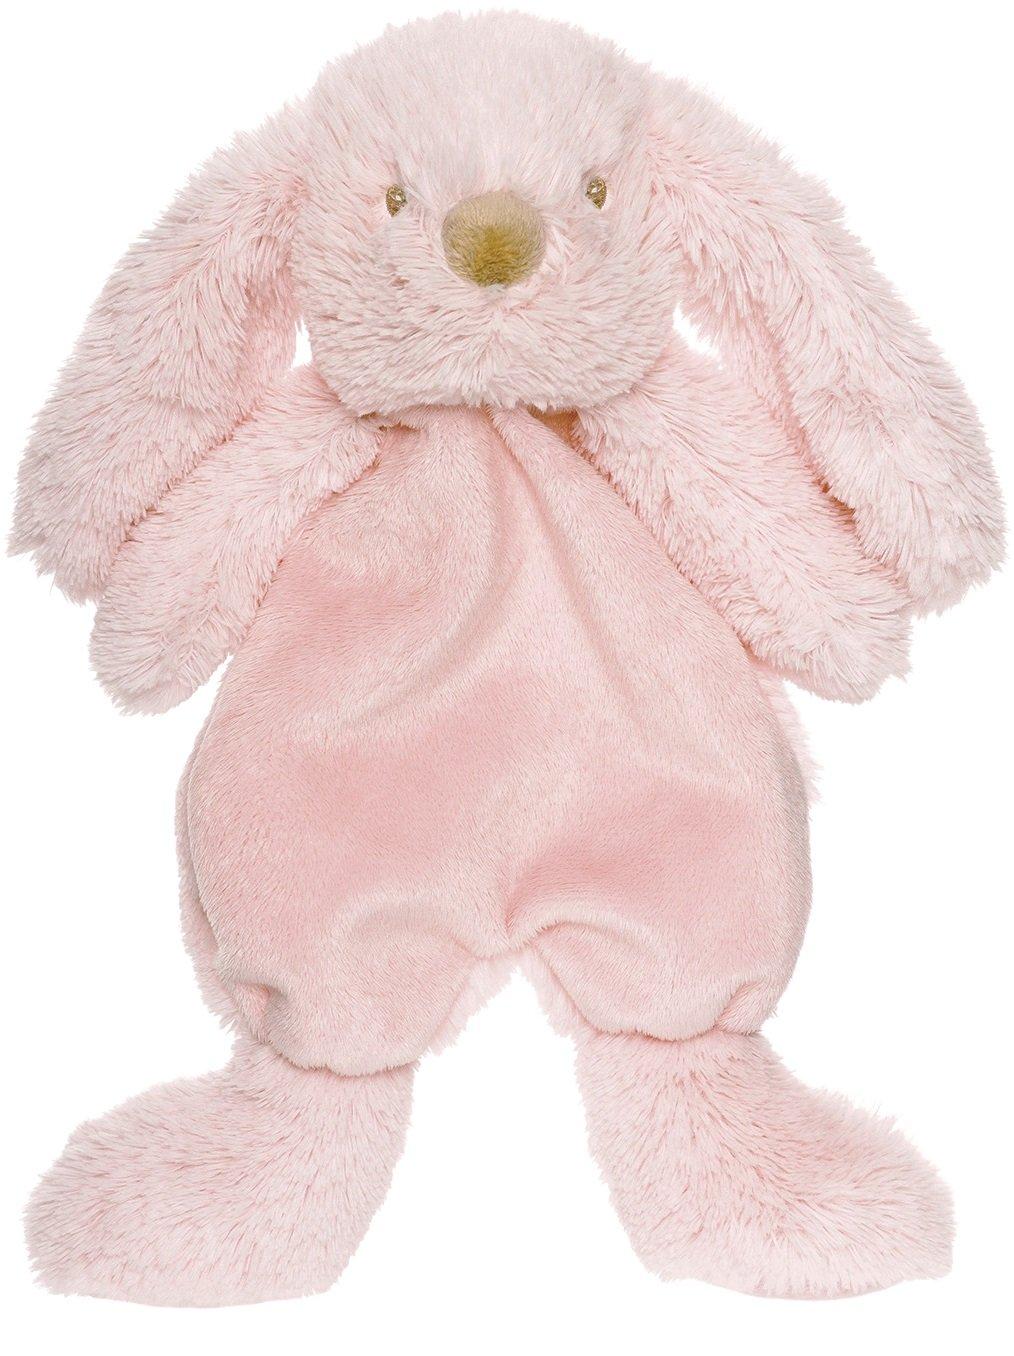 Teddykompaniet Lolli Bunnies Nusseklud Pink